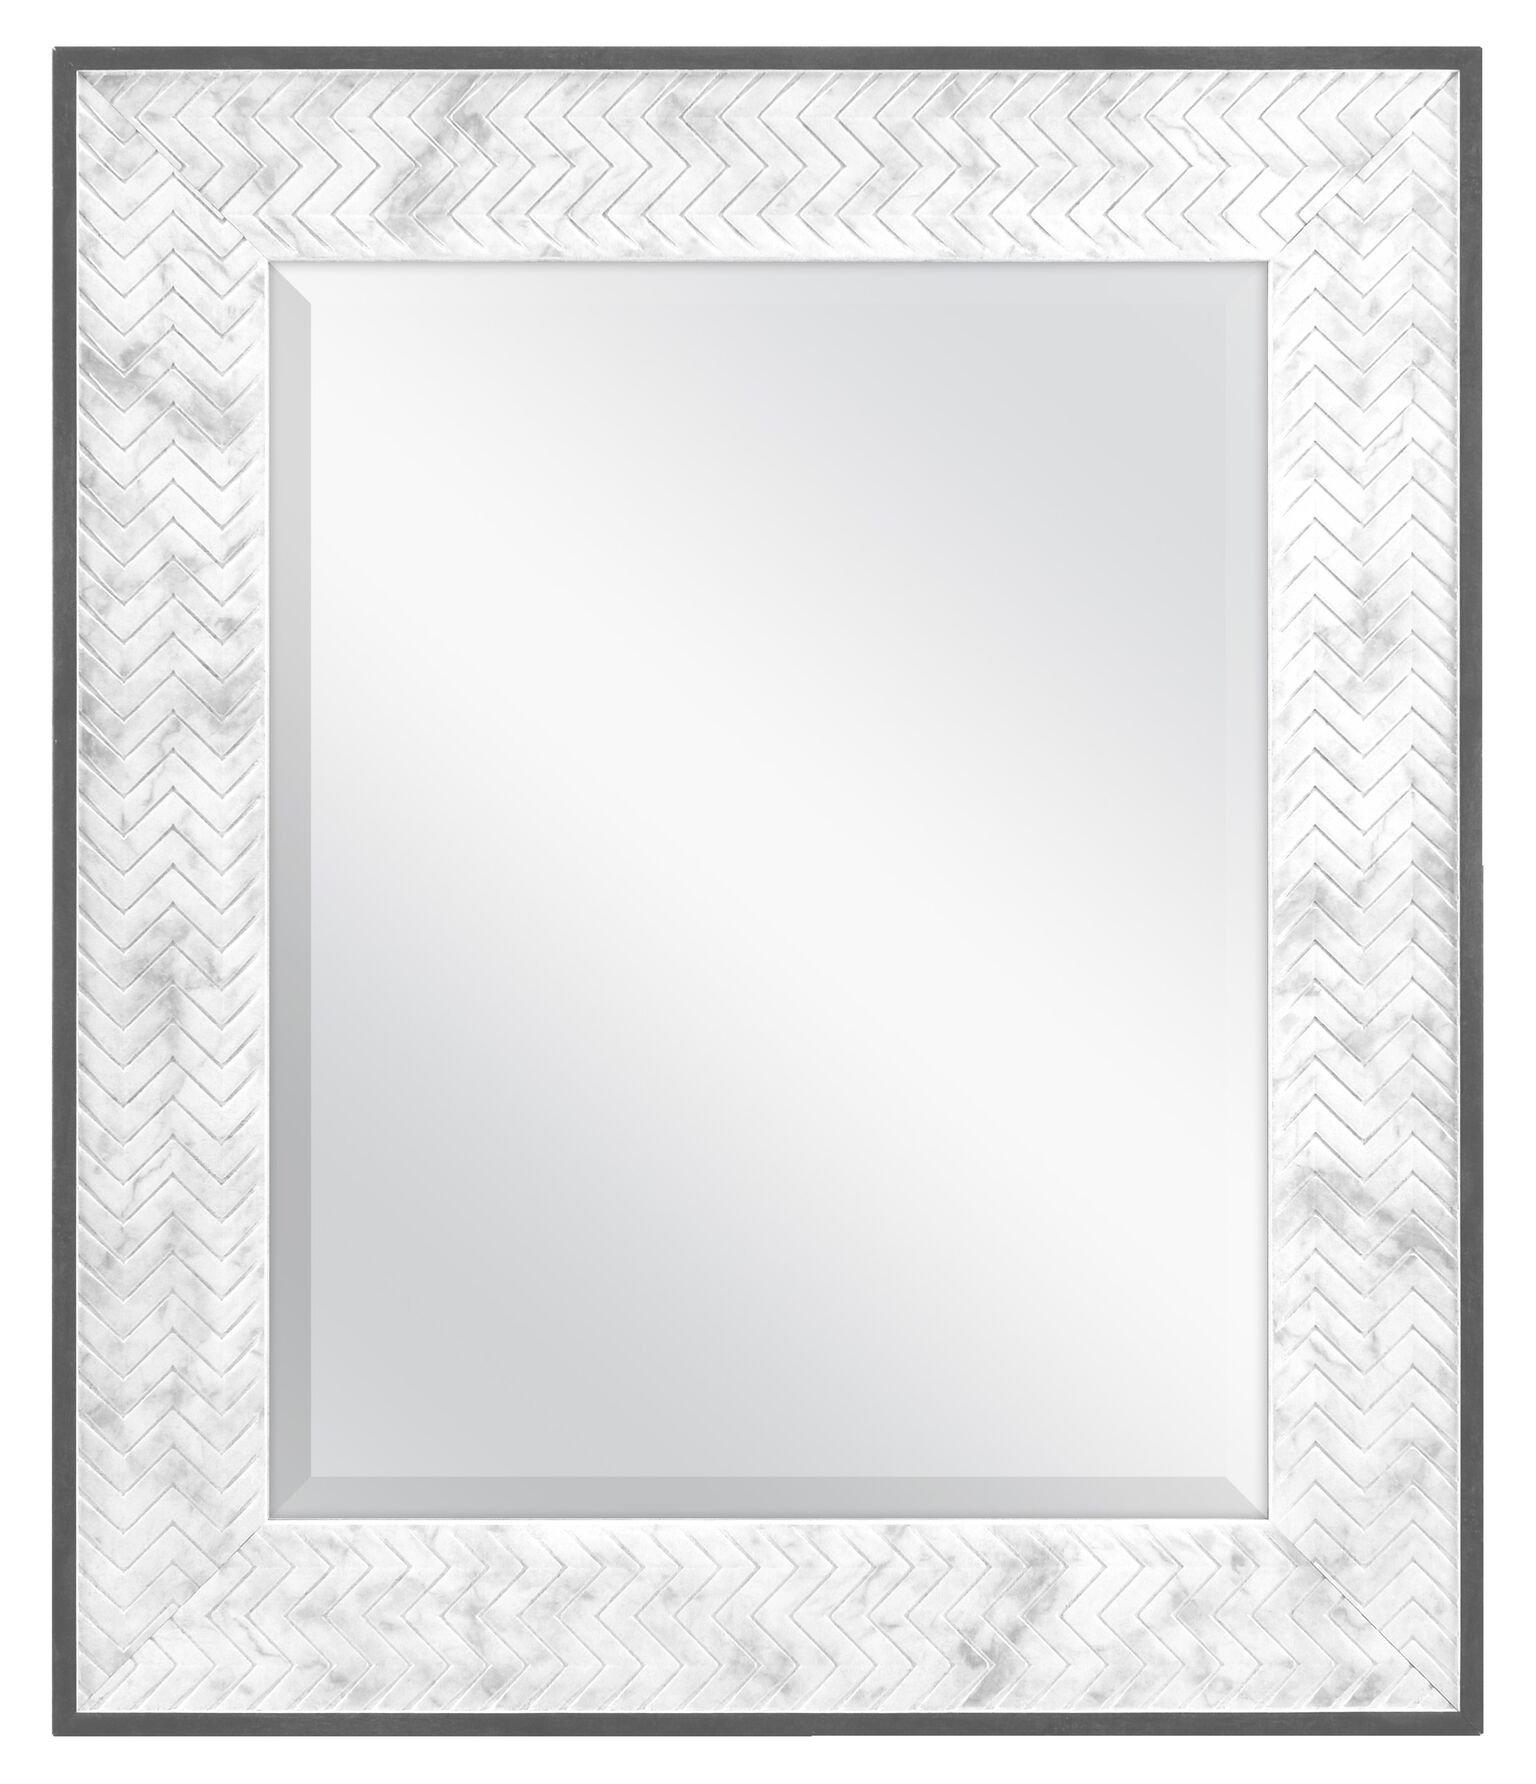 MCS 16x20 Inch Chevron, 22x26 Overall Size, Marble (66944) Mirror, 22 x 26 Inch,